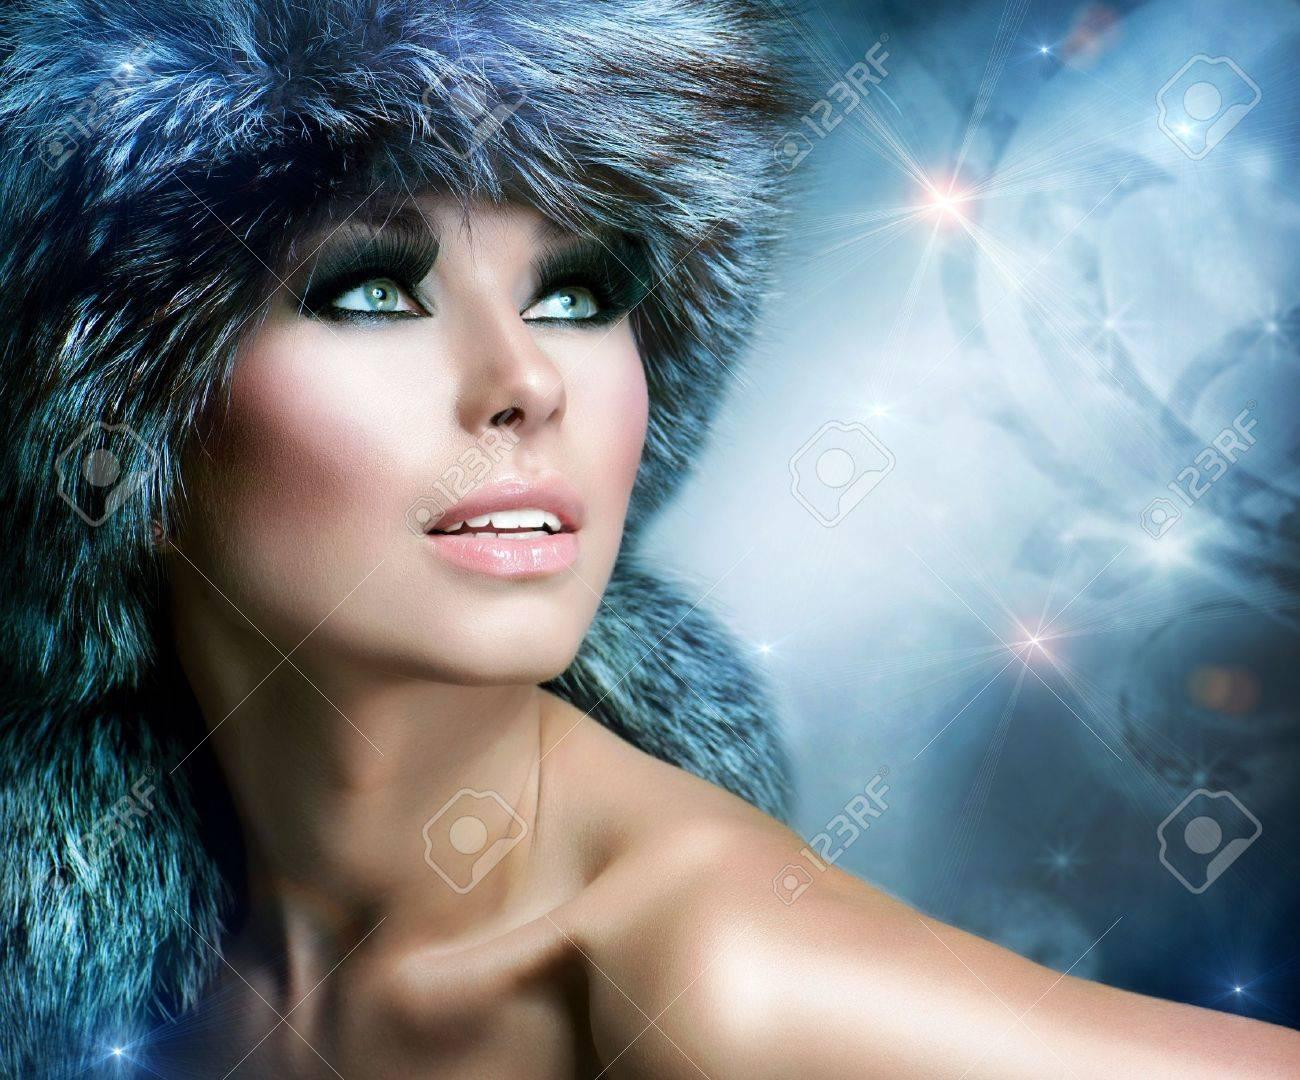 Winter Christmas Woman Portrait  Beautiful Girl in Fur Hat Stock Photo - 16313834